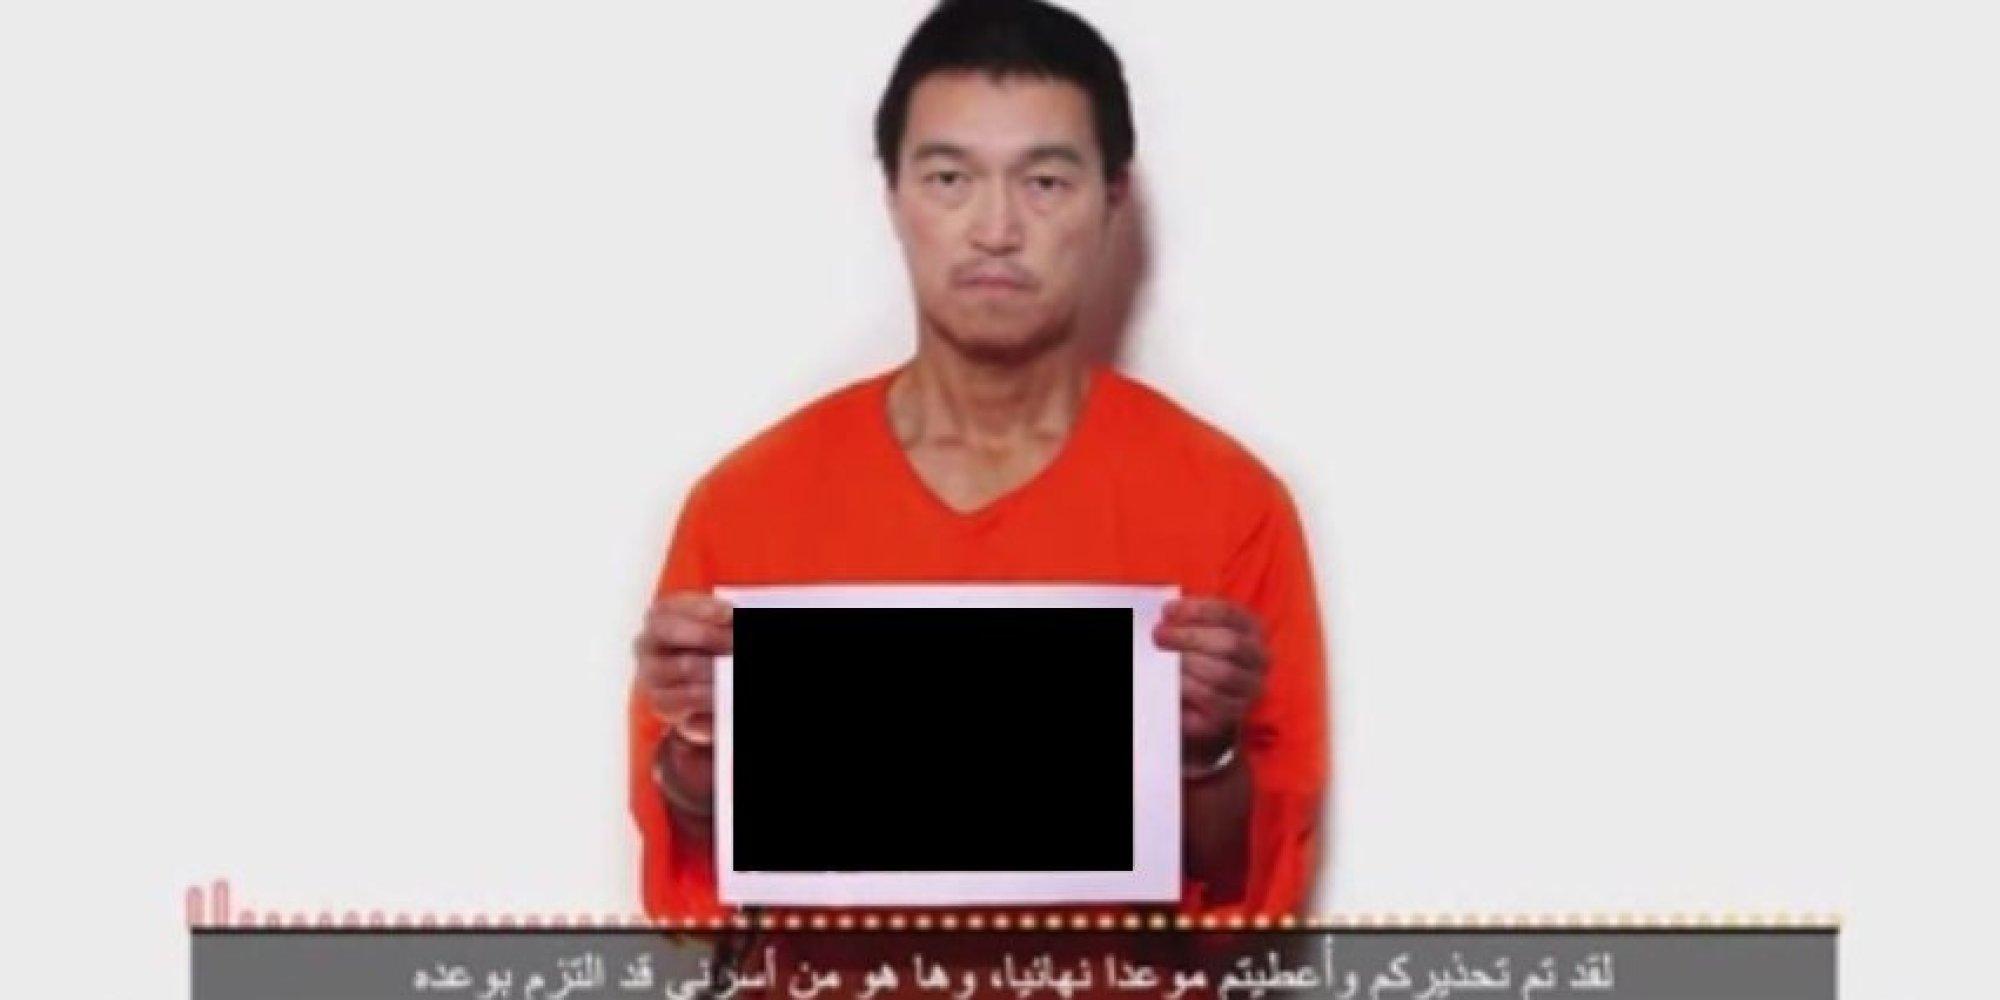 Video claims hostage haruna yukawa has been killed but doubts remain